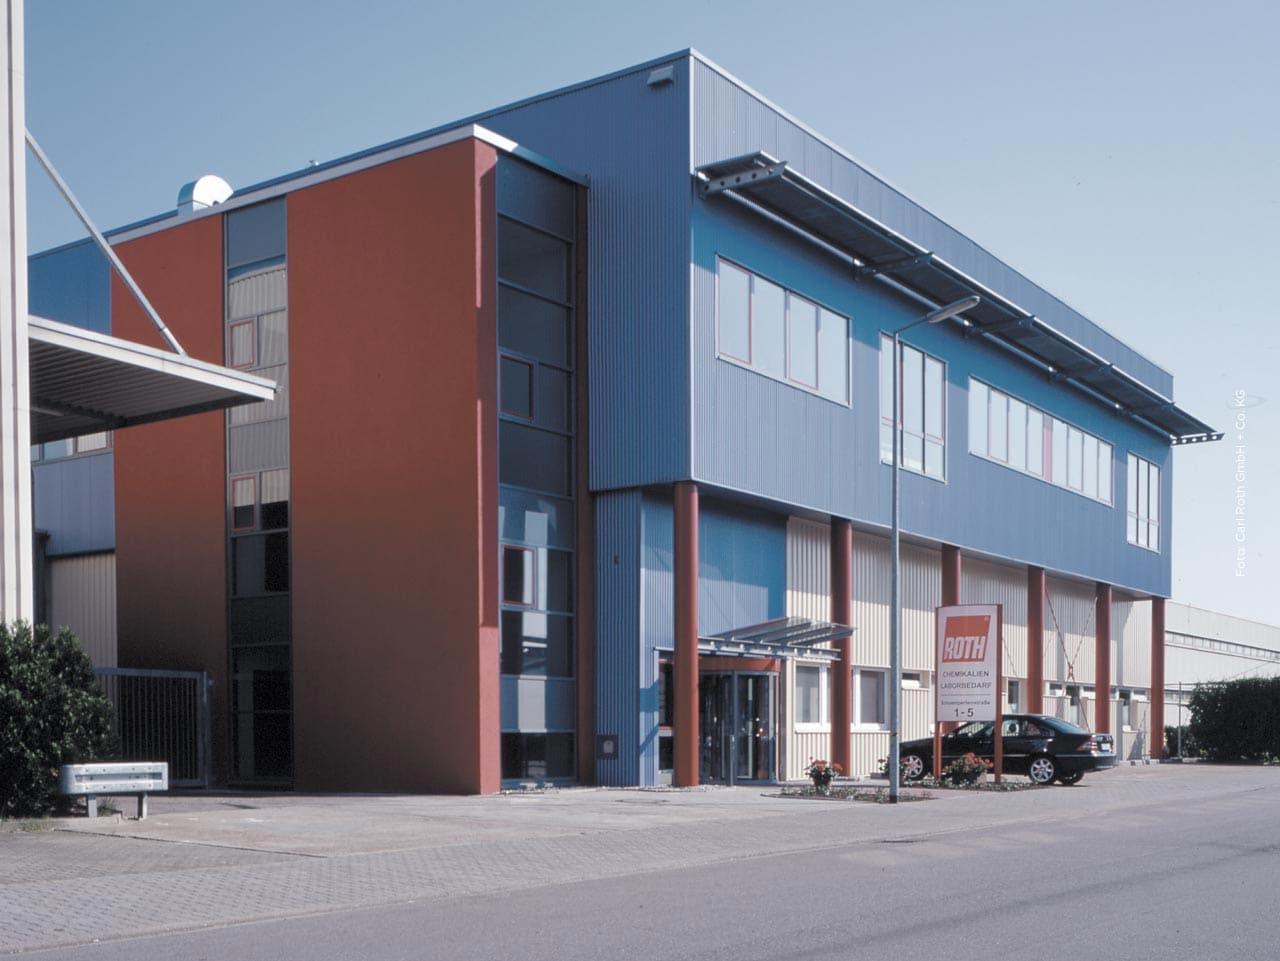 Carl Roth GmbH